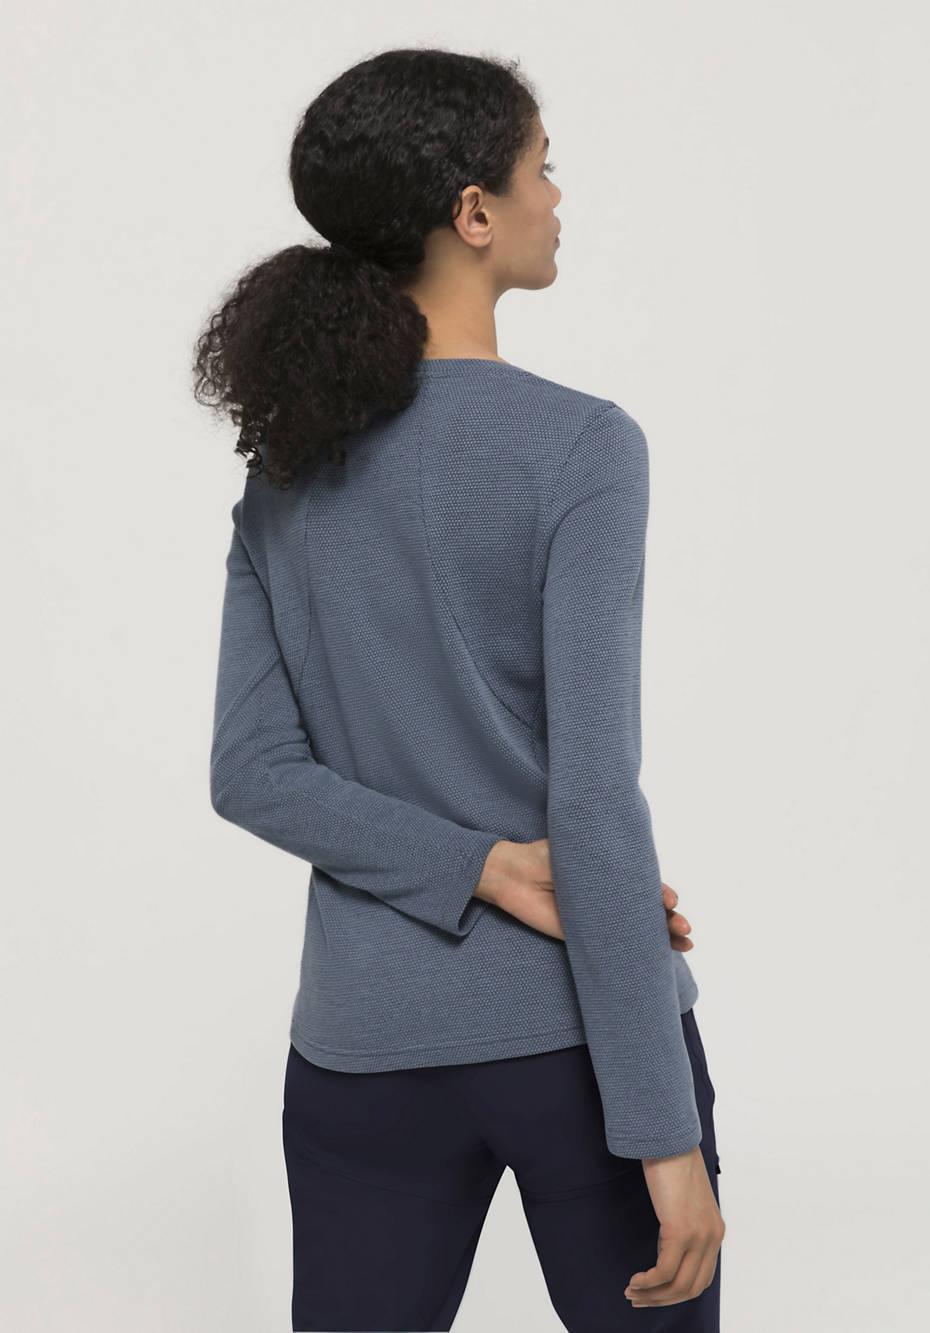 Functional shirt made of organic merino wool with organic cotton